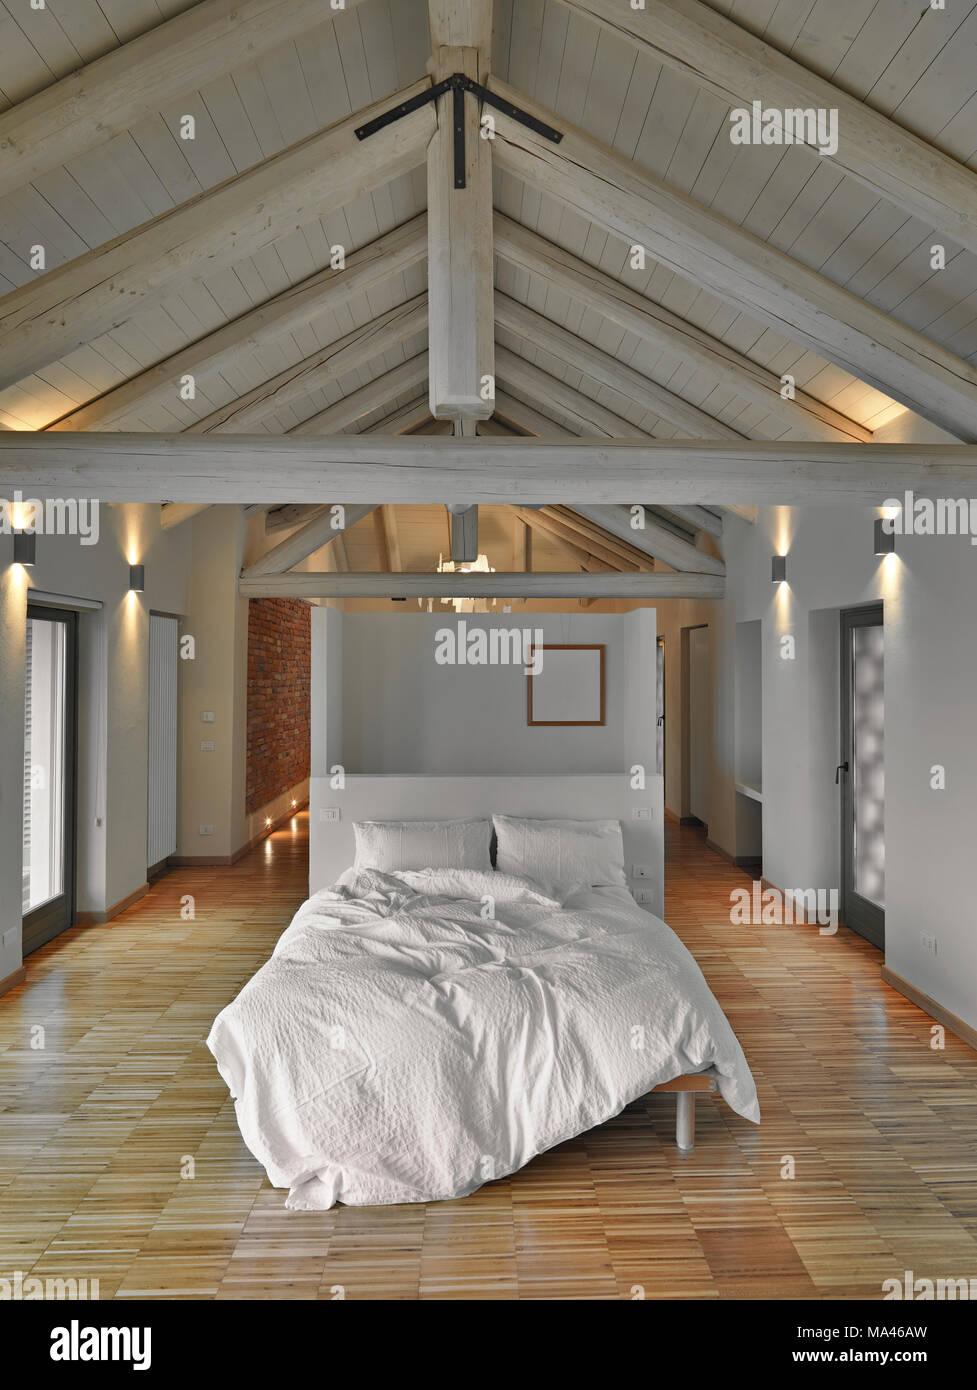 Moderne Schlafzimmer im Dachgeschoss Zimmer mit Holzdecke ...